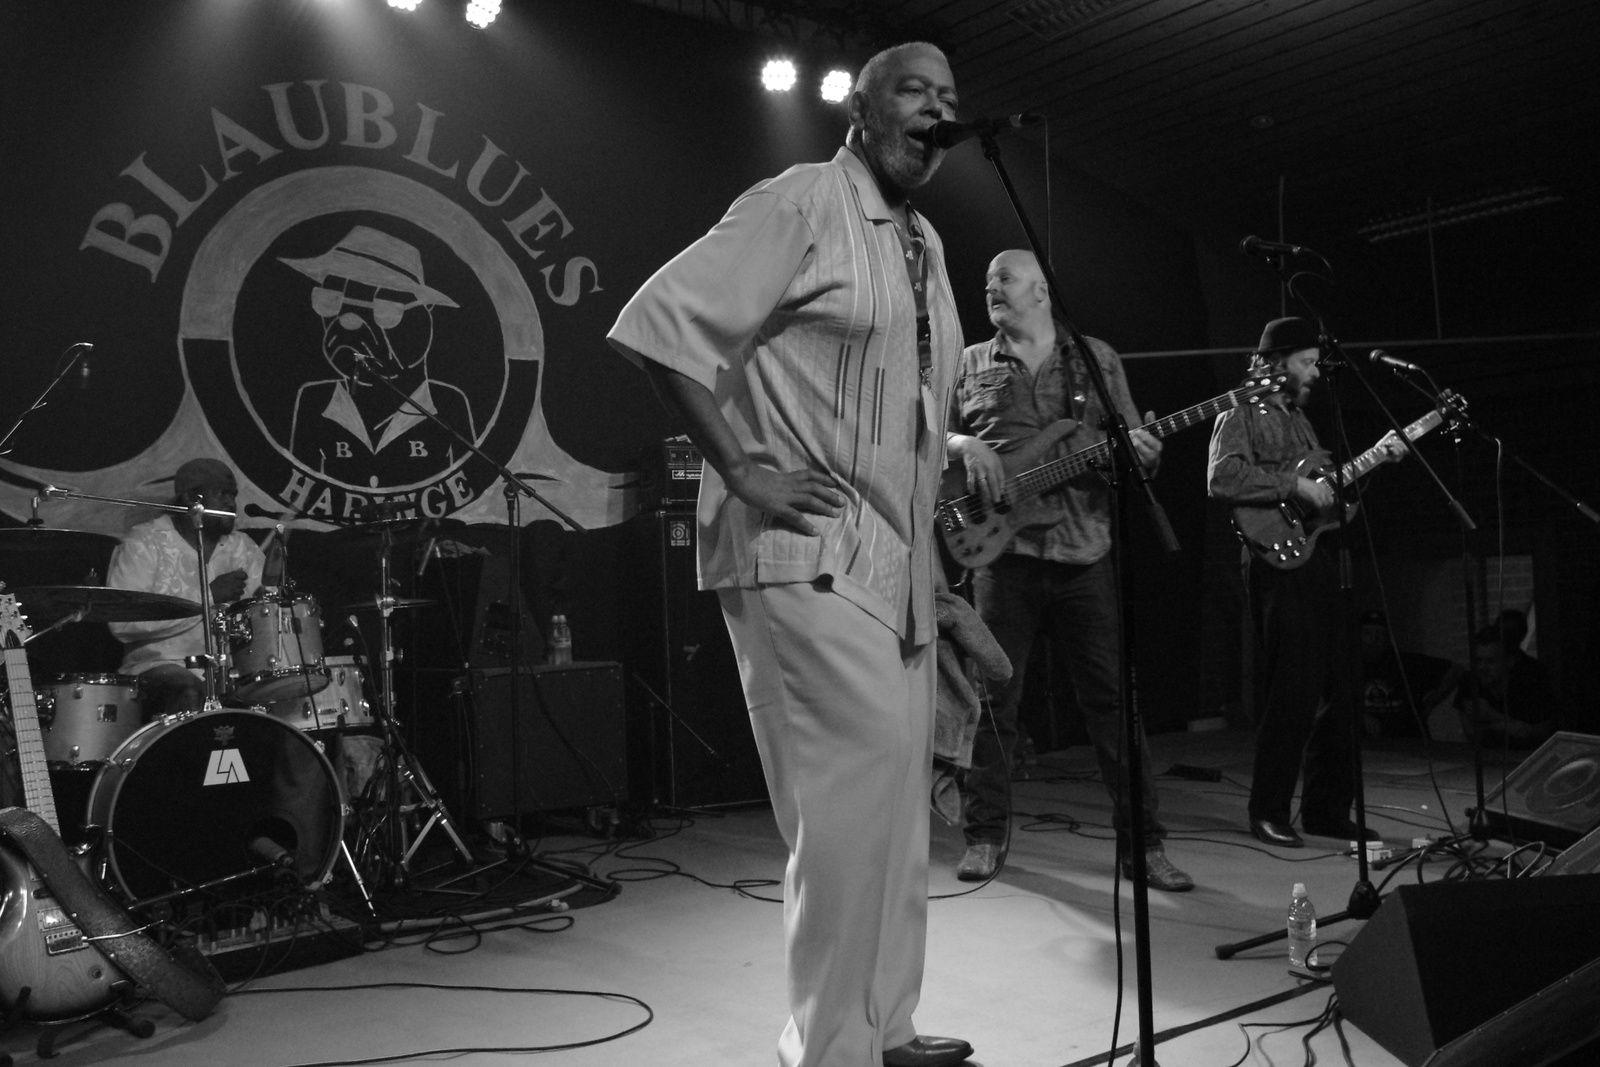 Zac Harmon Band - 11/11/2017 - Blaublues Festival, Haringe (B)